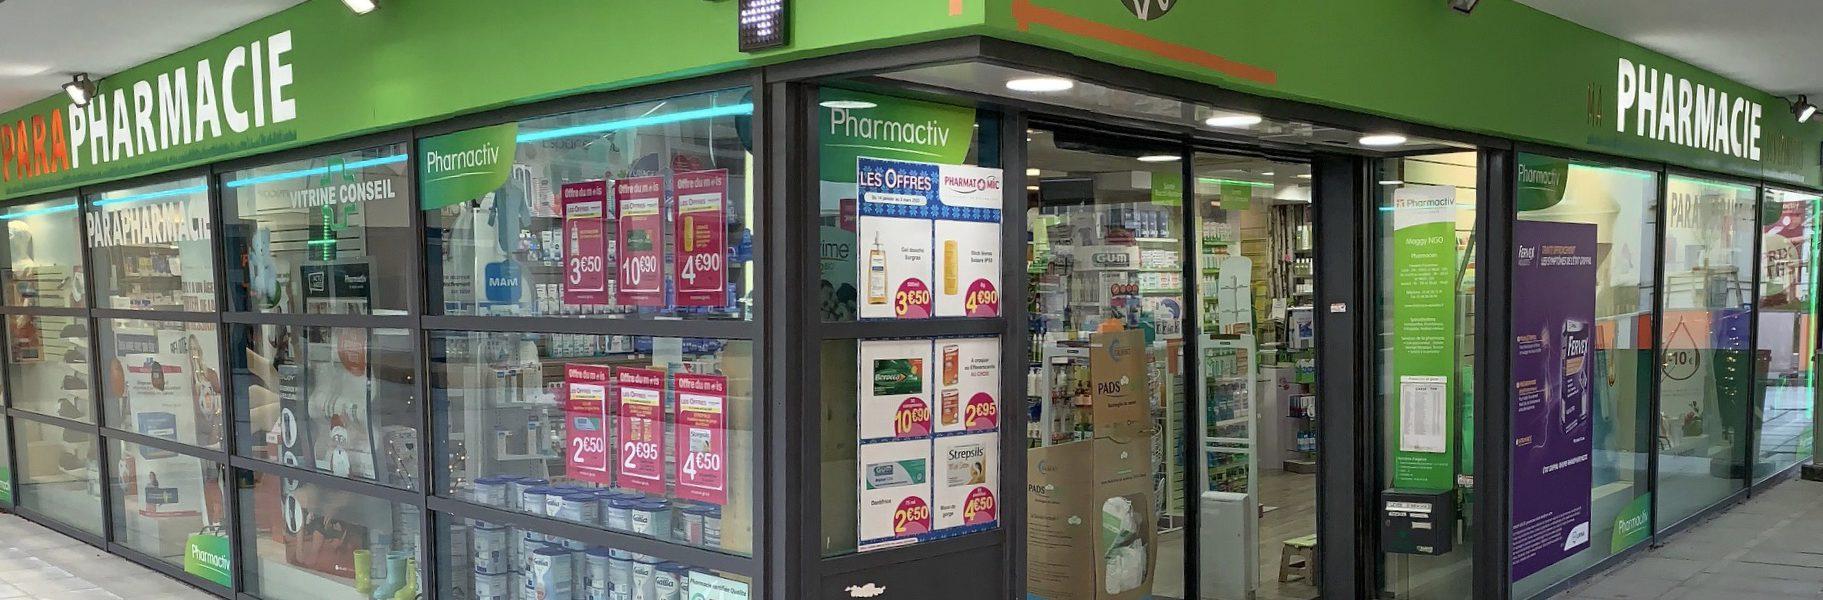 Pharmacie DES EPINETTES - Image Homepage 1